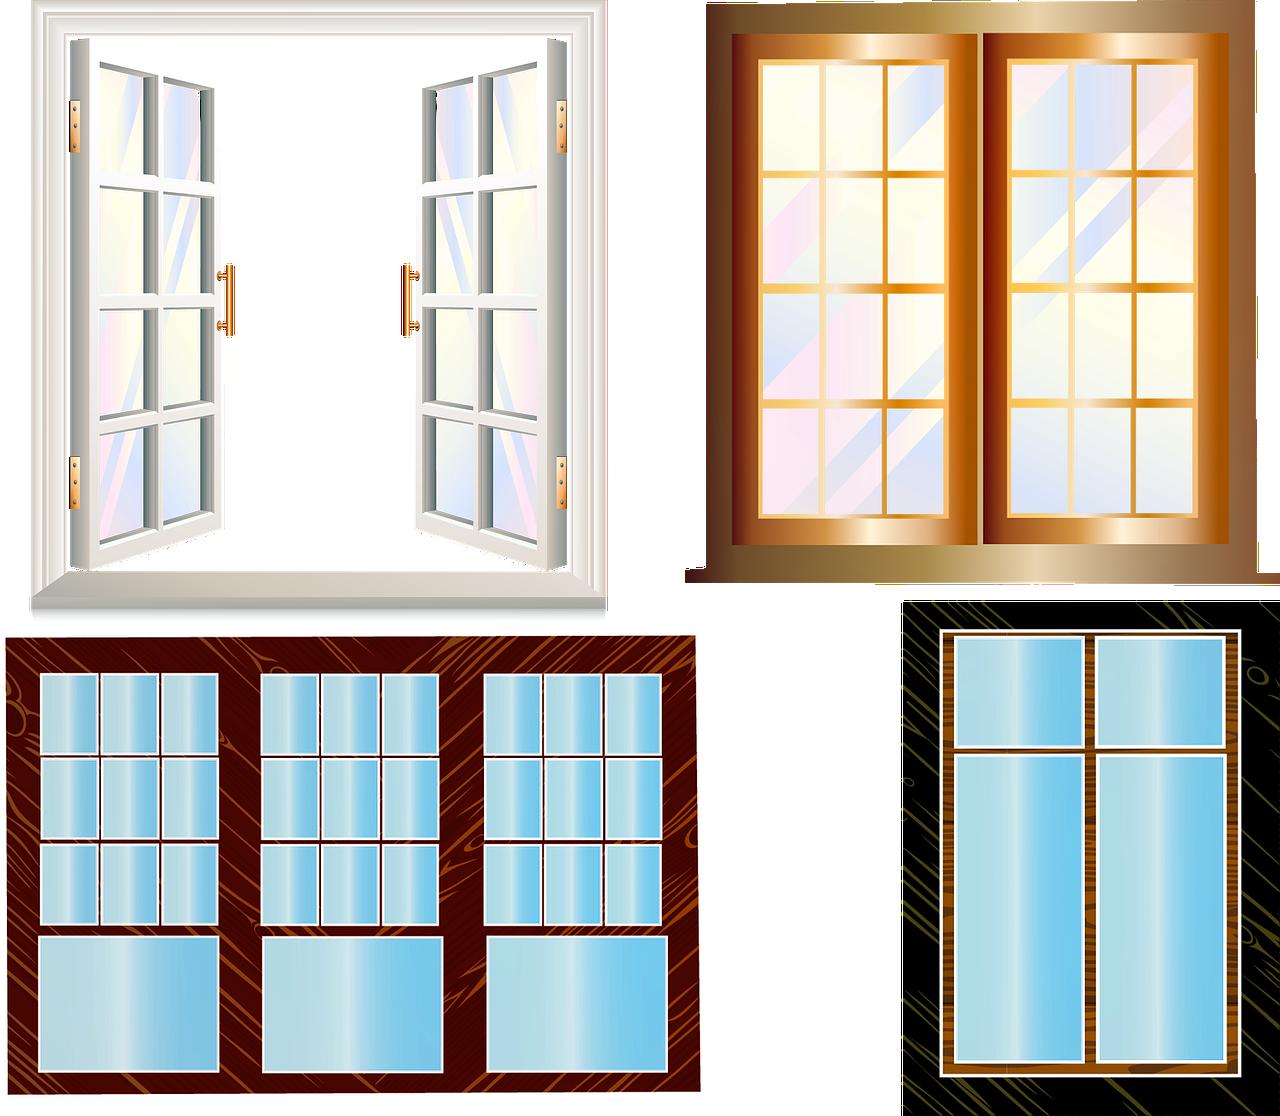 Oblika lesenih oken